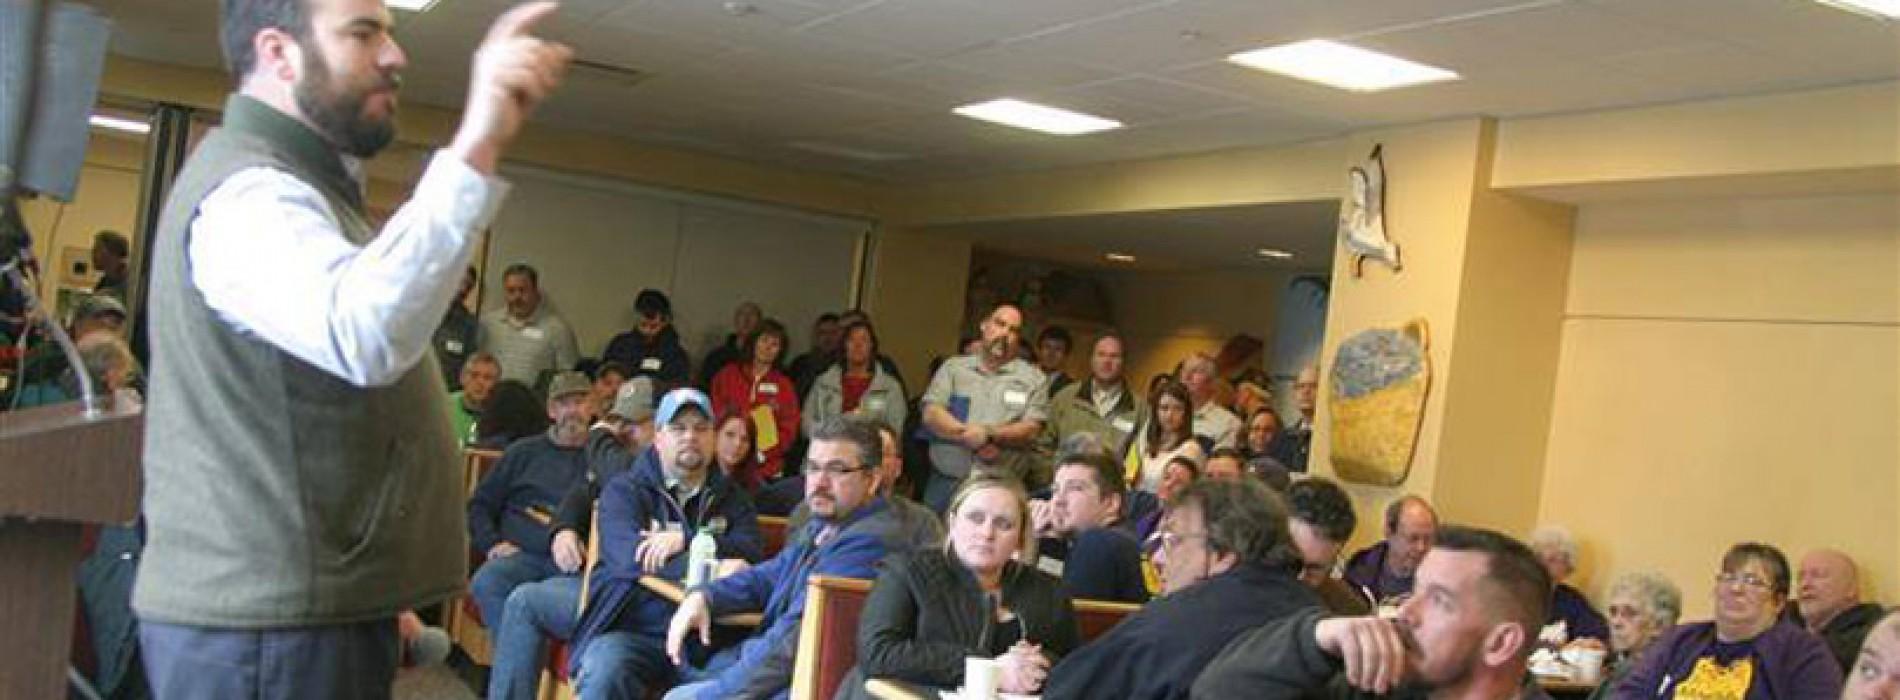 Maine AFL-CIO members lobby legislature for a clean minimum wage vote